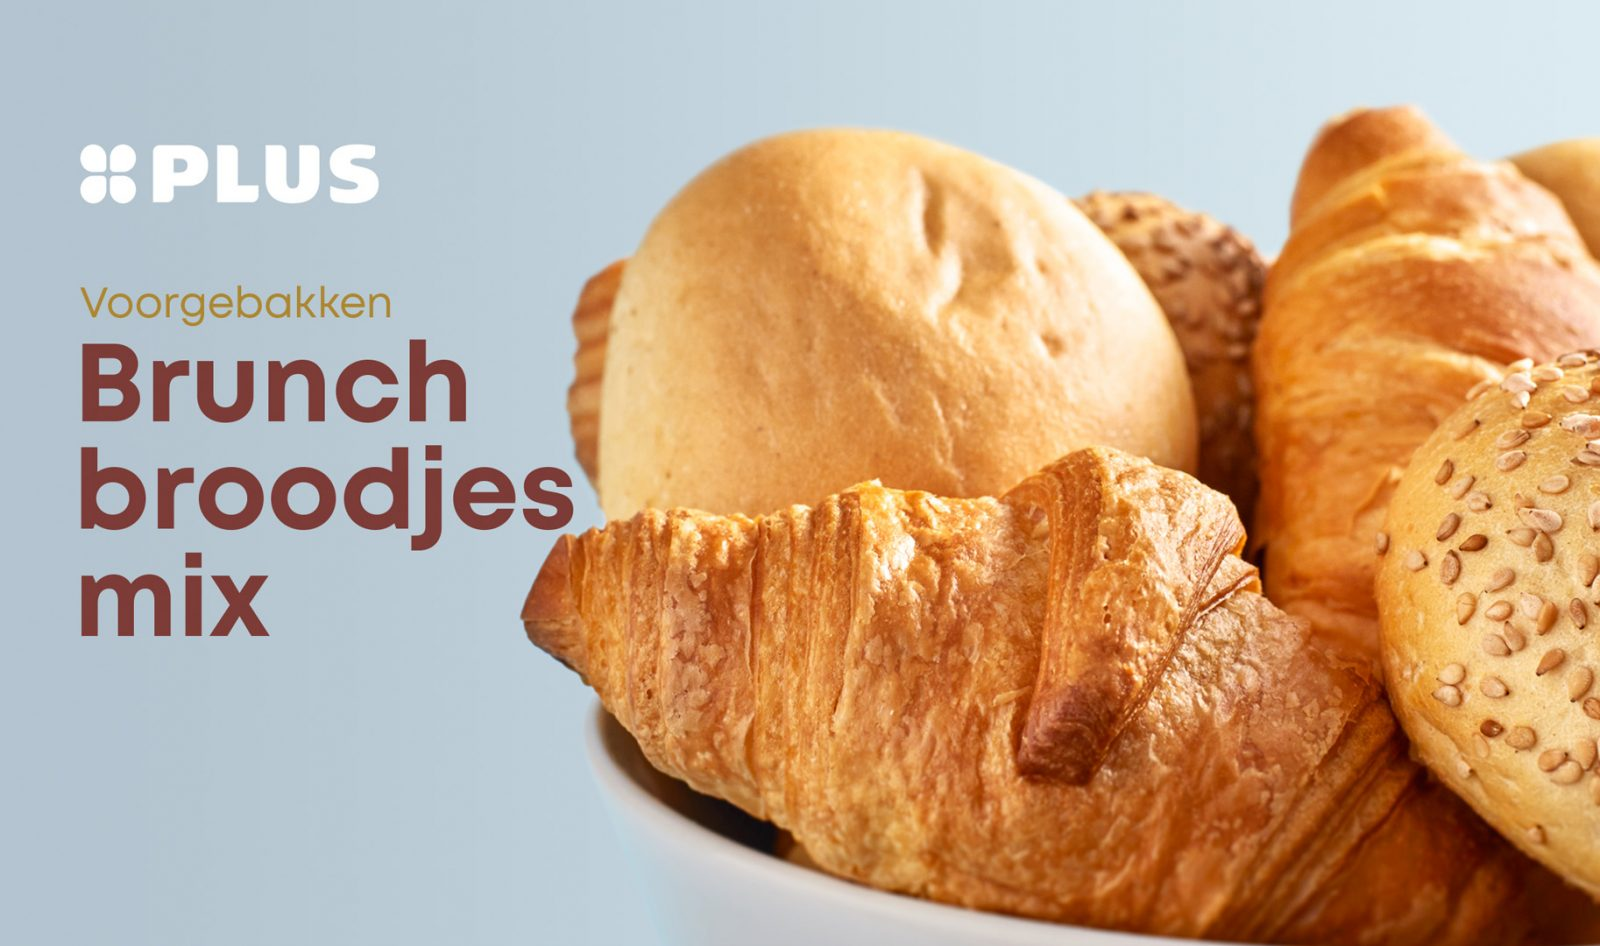 Floris Holtland - packaging photography - bread - brunch mix